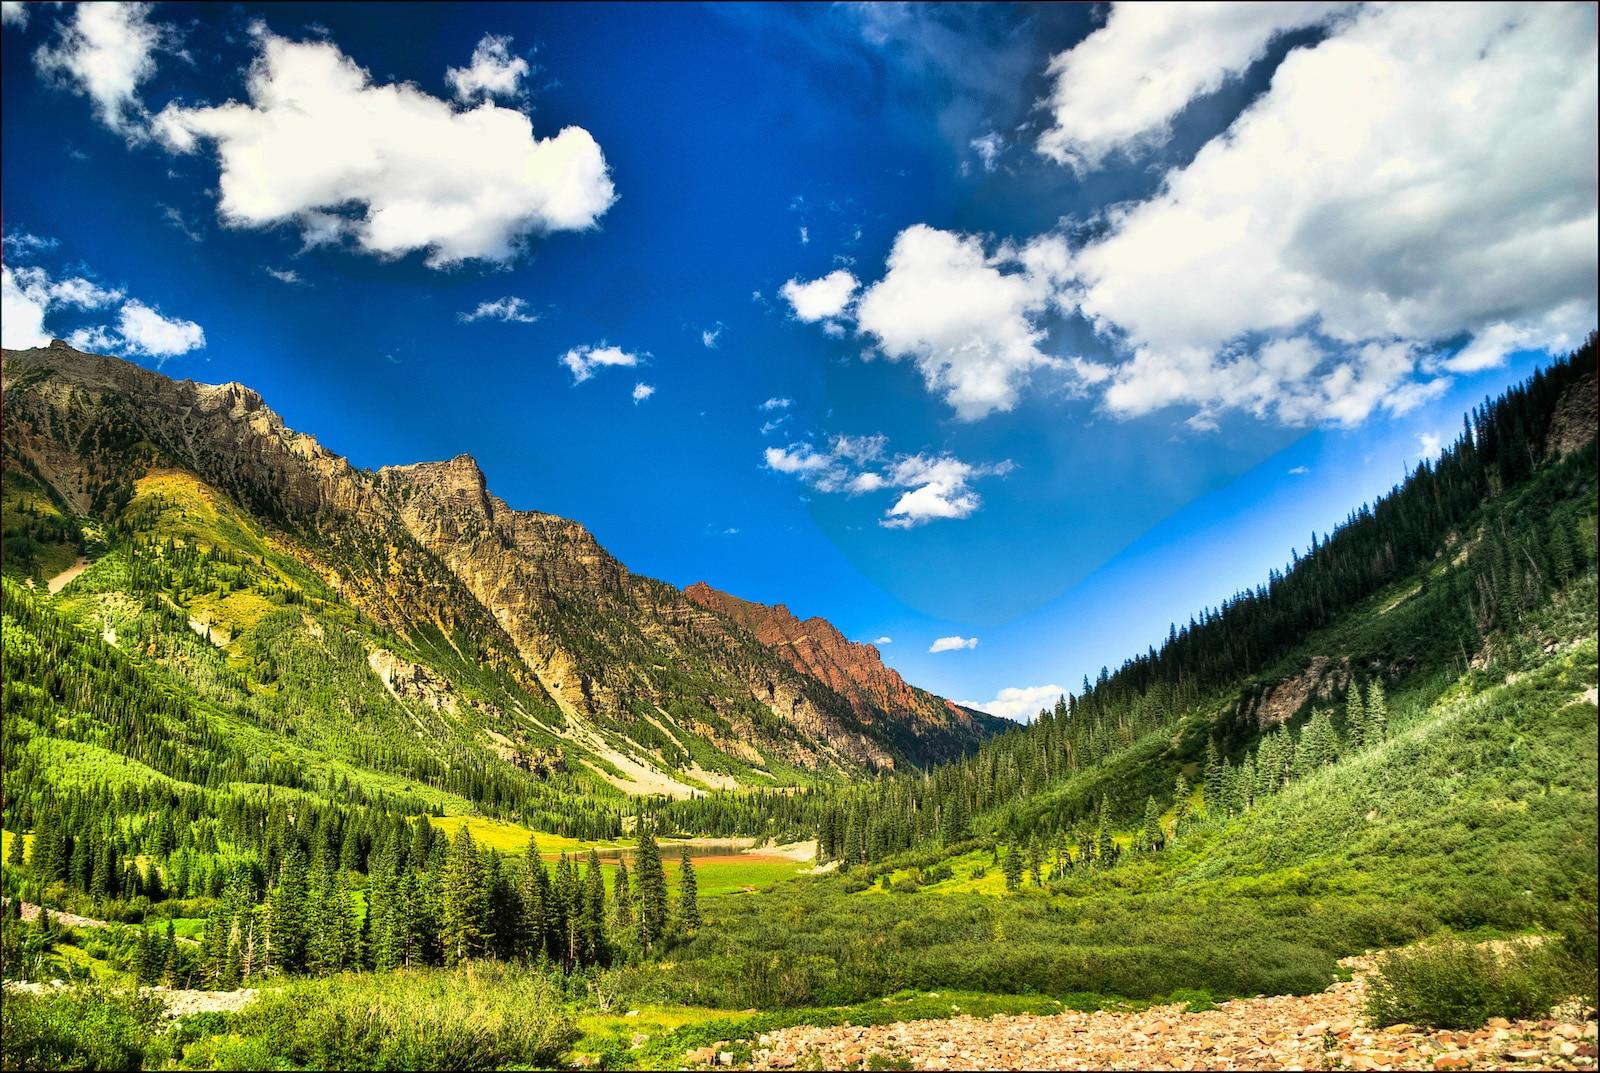 Maroon Bells-Snowmass Wilderness Area, CO